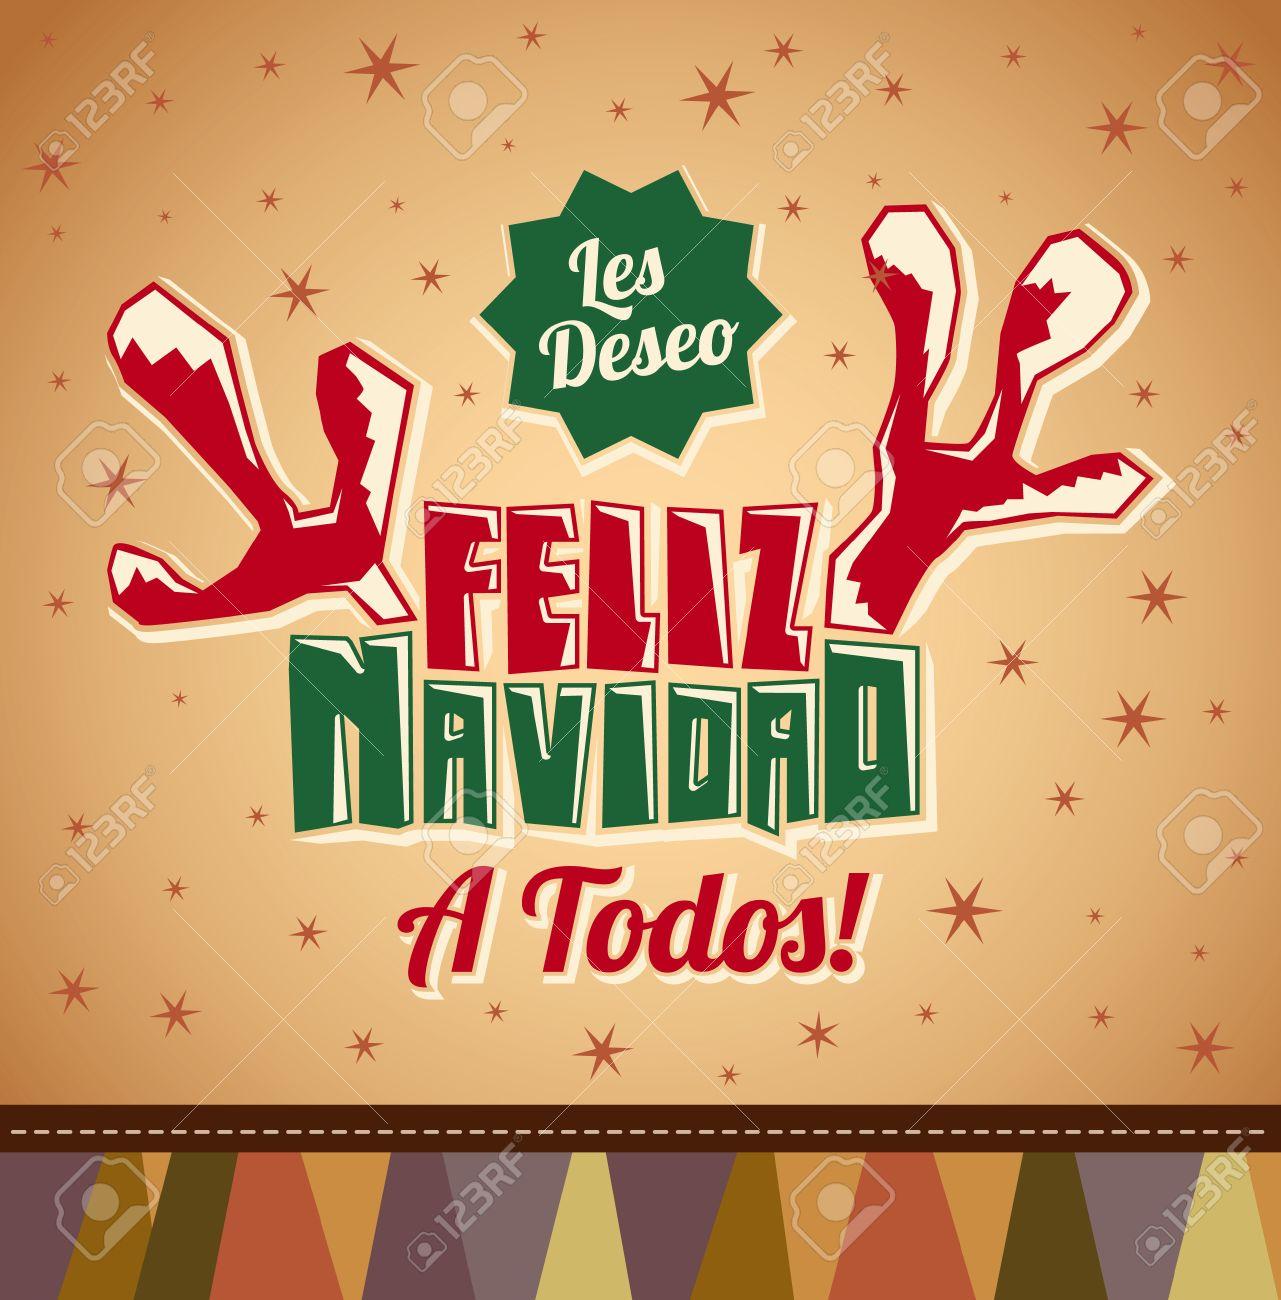 Les Deseo Feliz Navidad A Todos - I Wish Merry Christmas To All ...